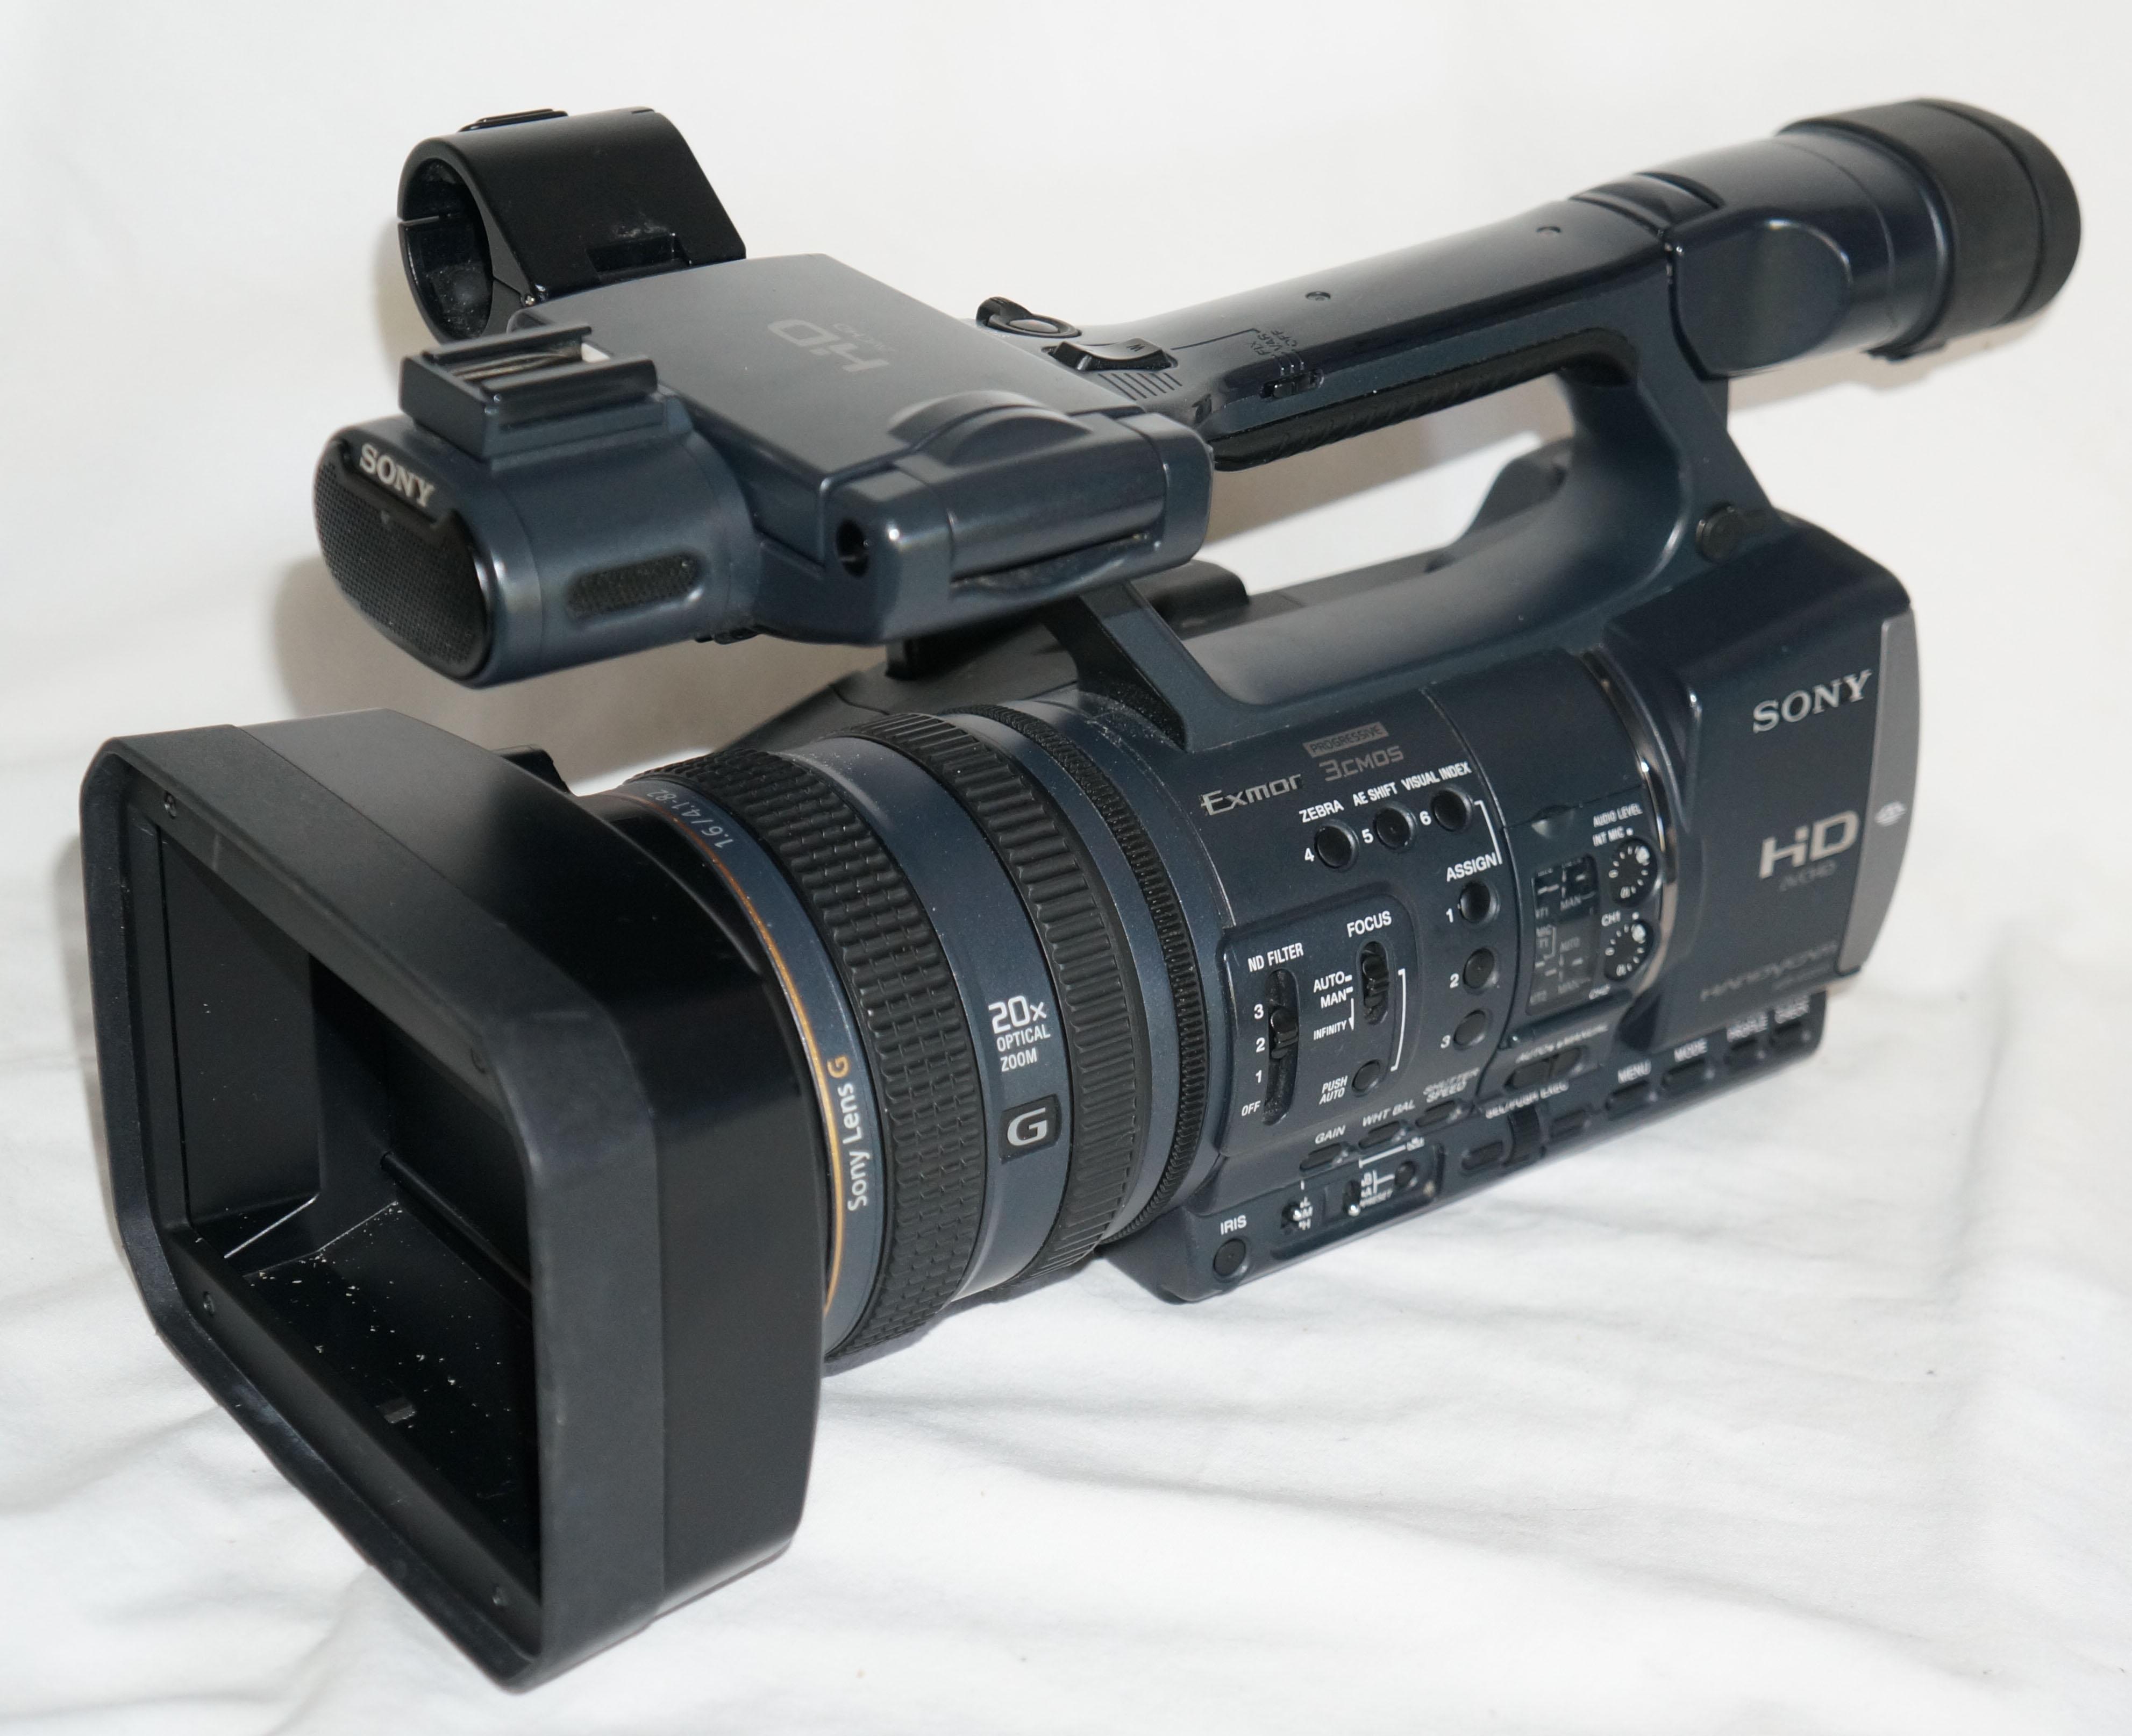 Sony Handycam Hdr Ax2000 Hd Avchd Camcorder 90 Day